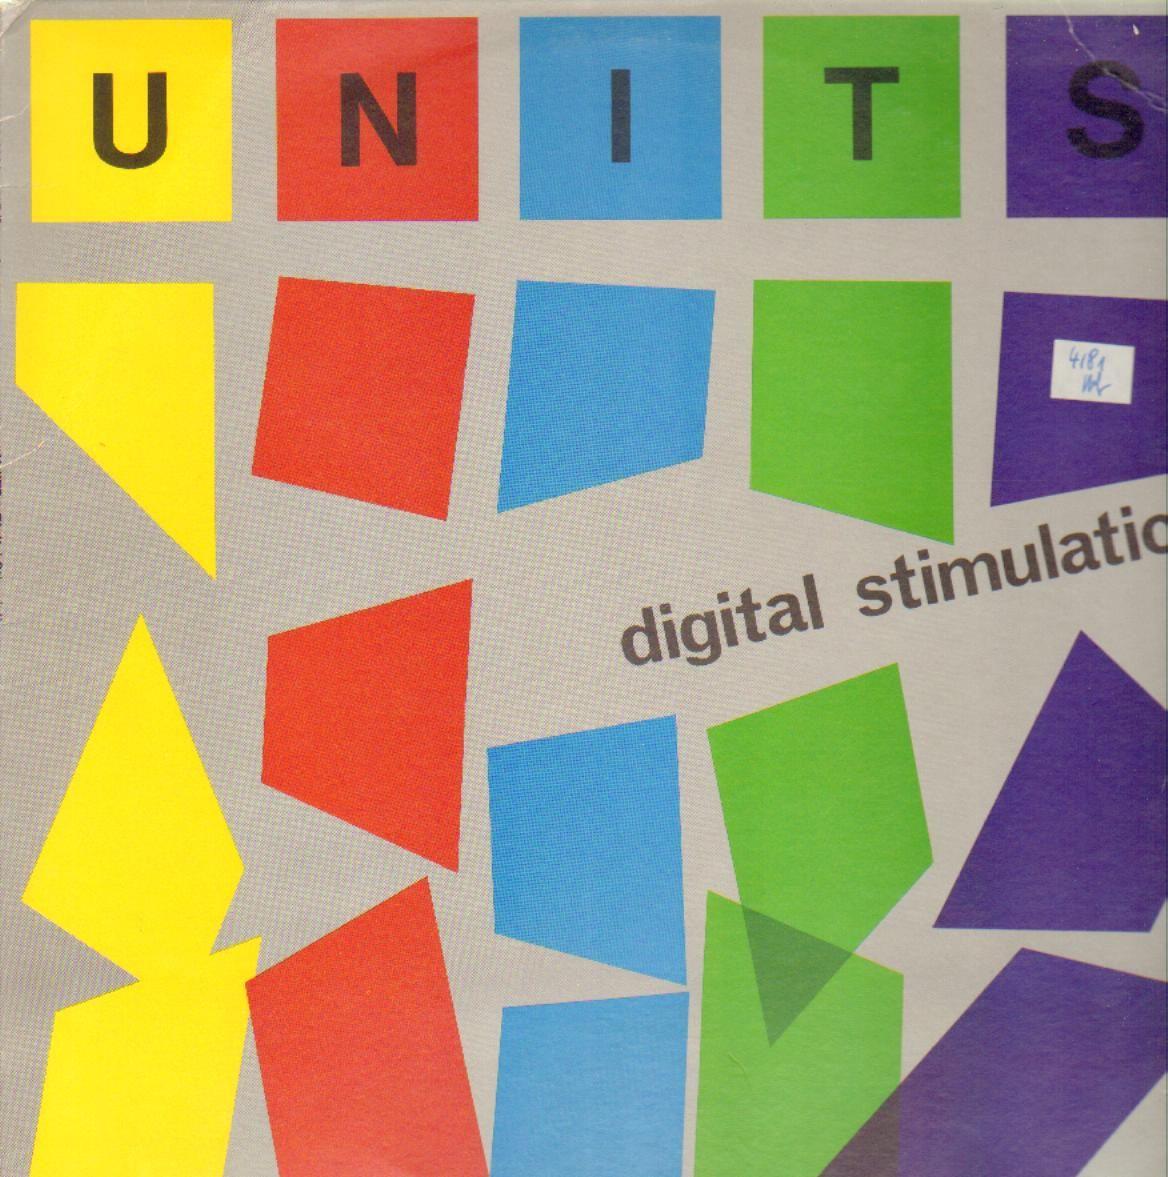 The Units Digital Stimulation